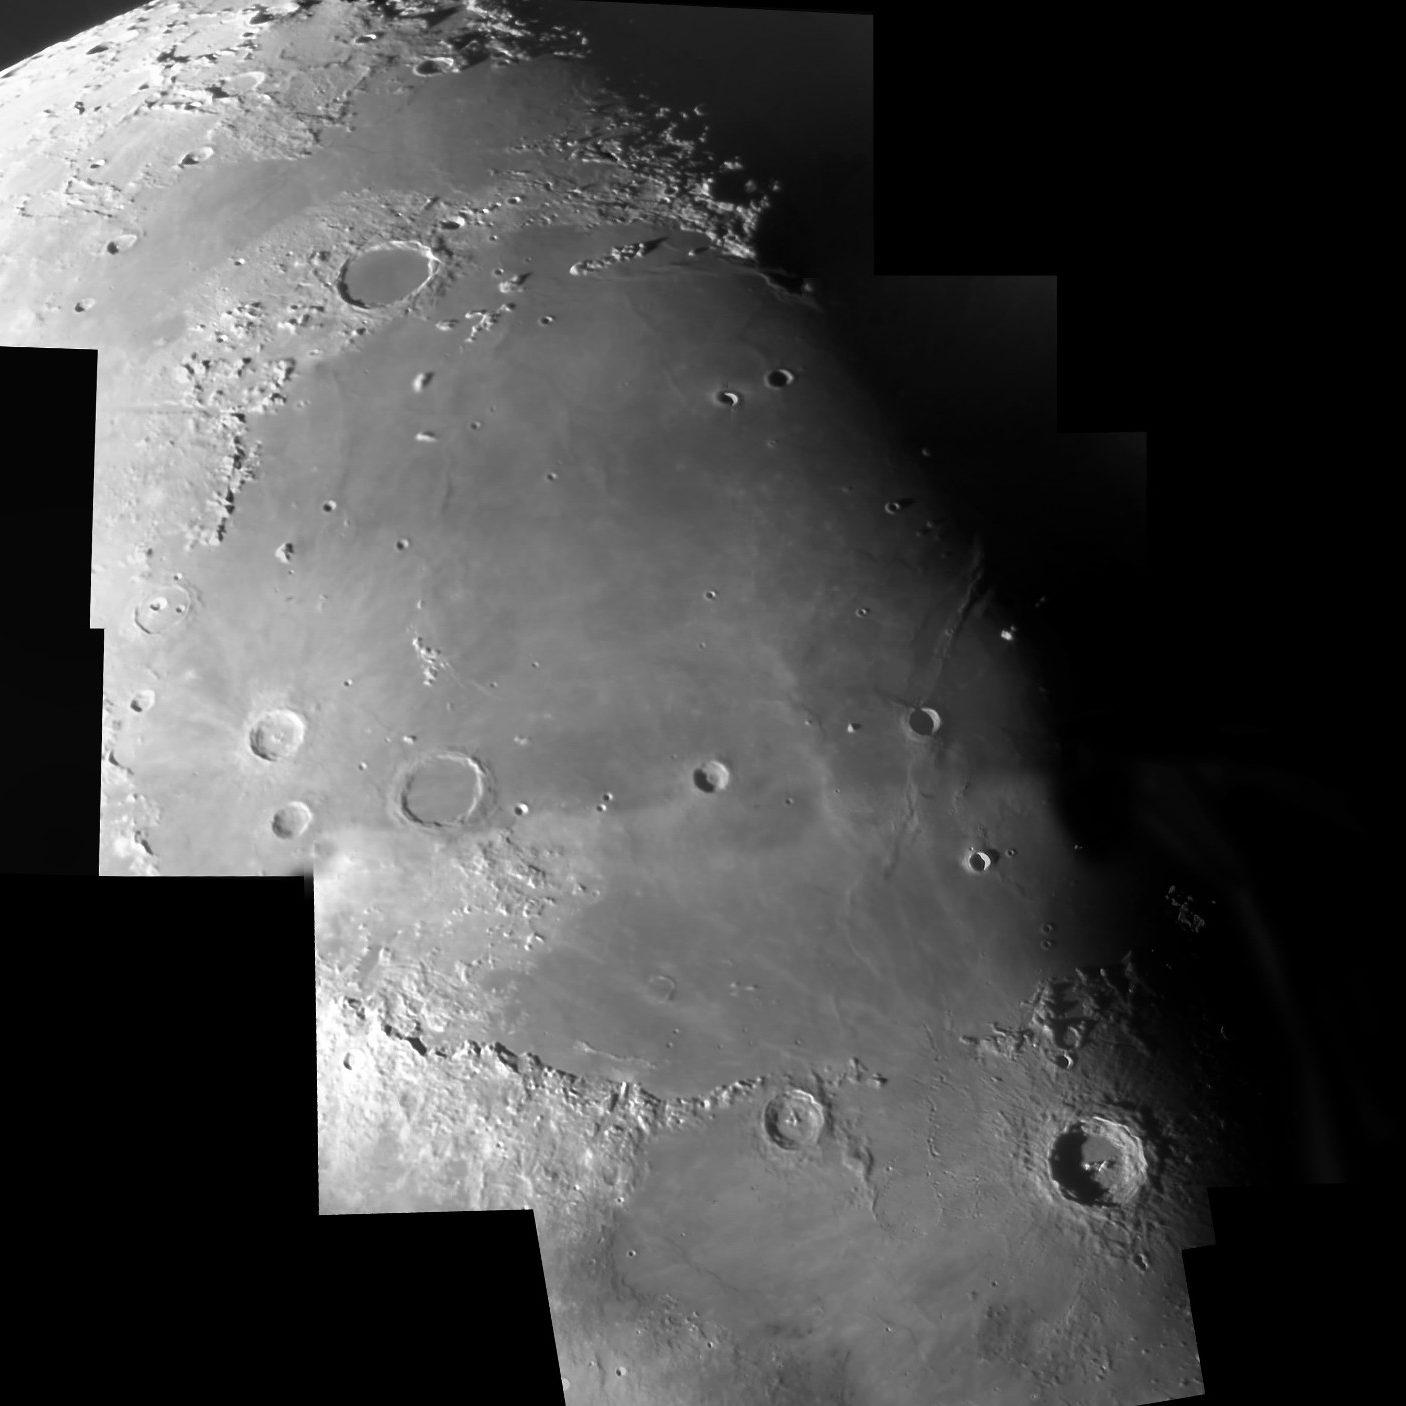 Лунный рельеф